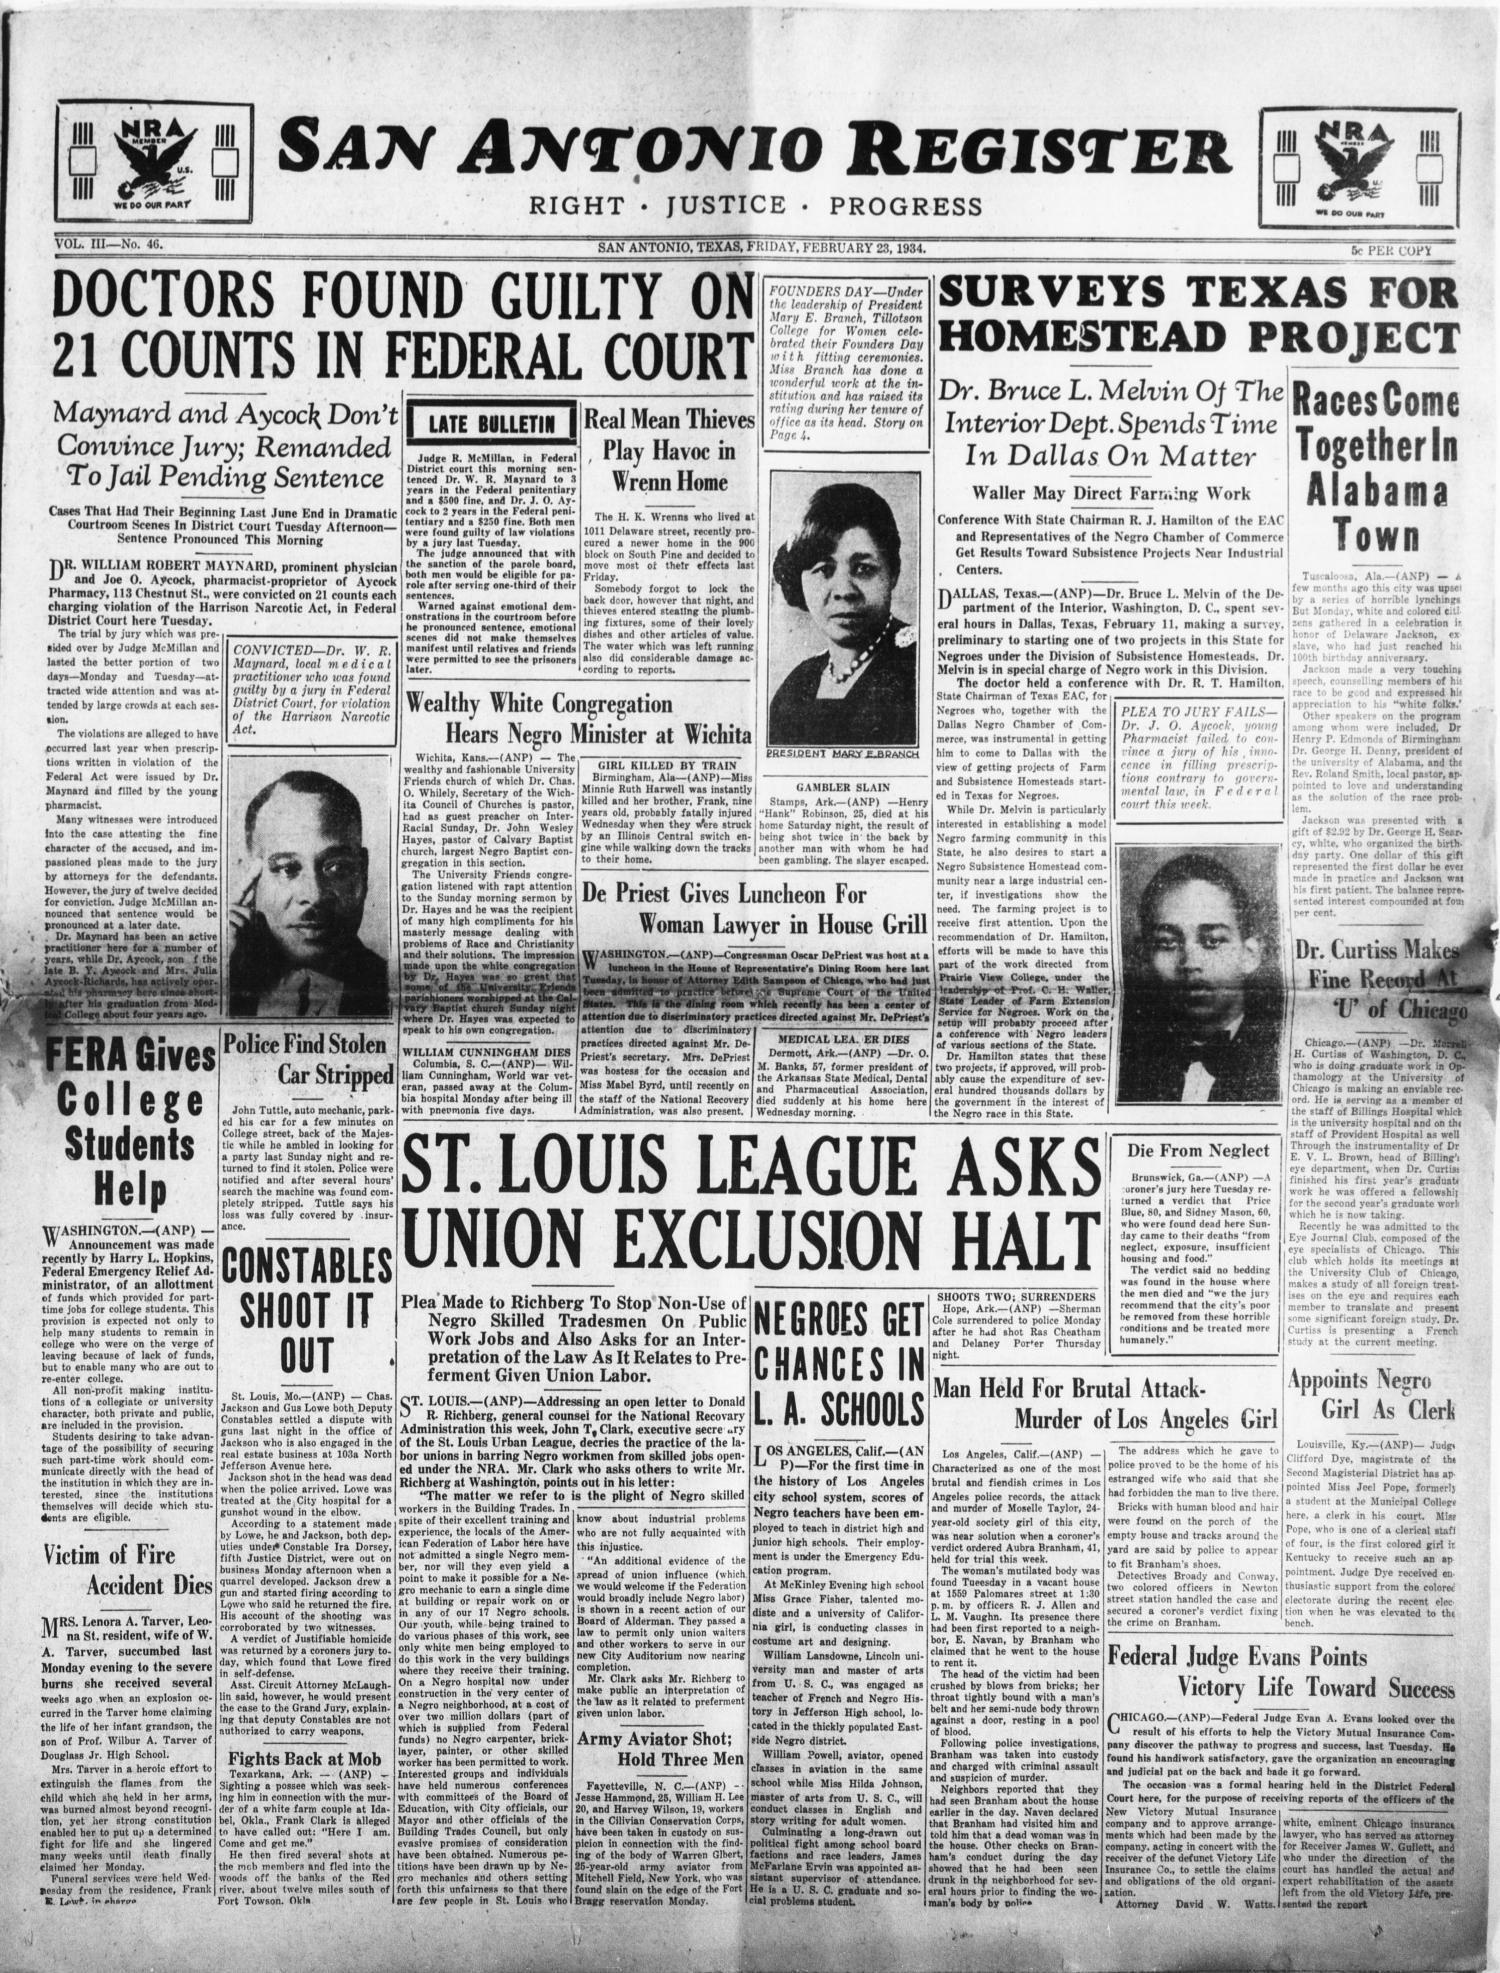 Ldr W R Maynard San Antonio Medical Professionals Morning Papers